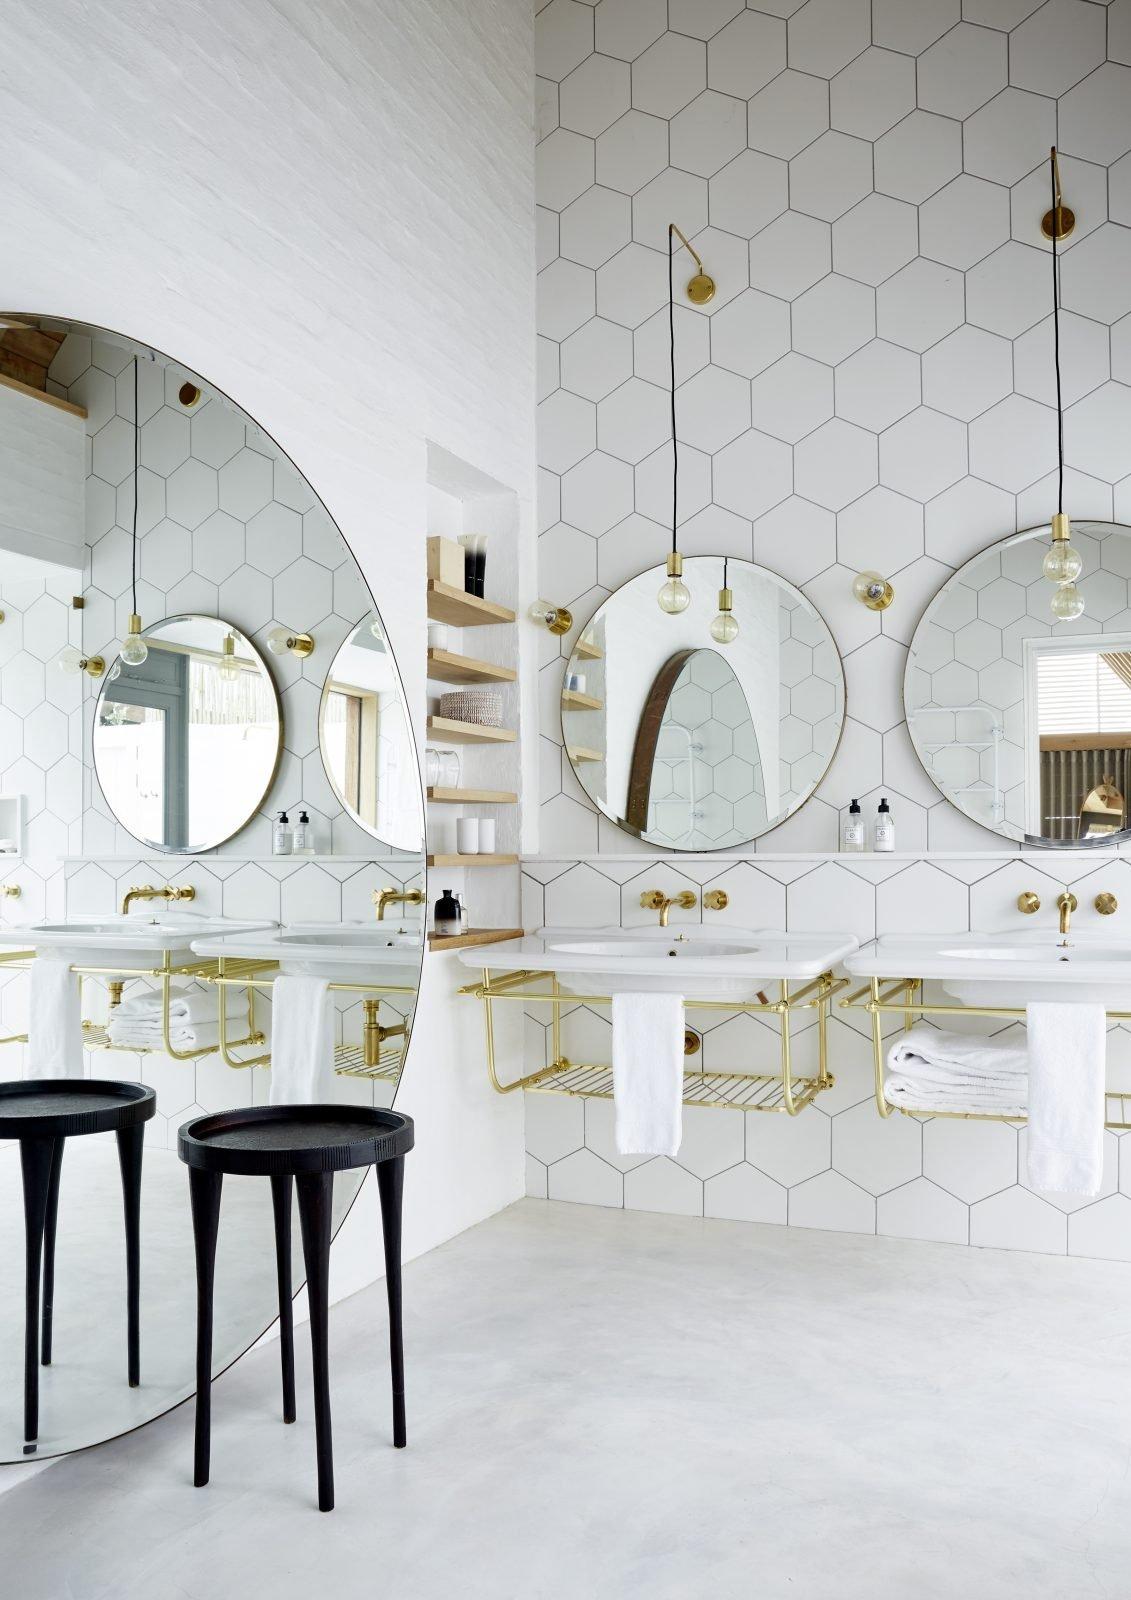 Bathroom mirror - Divine Inspiration